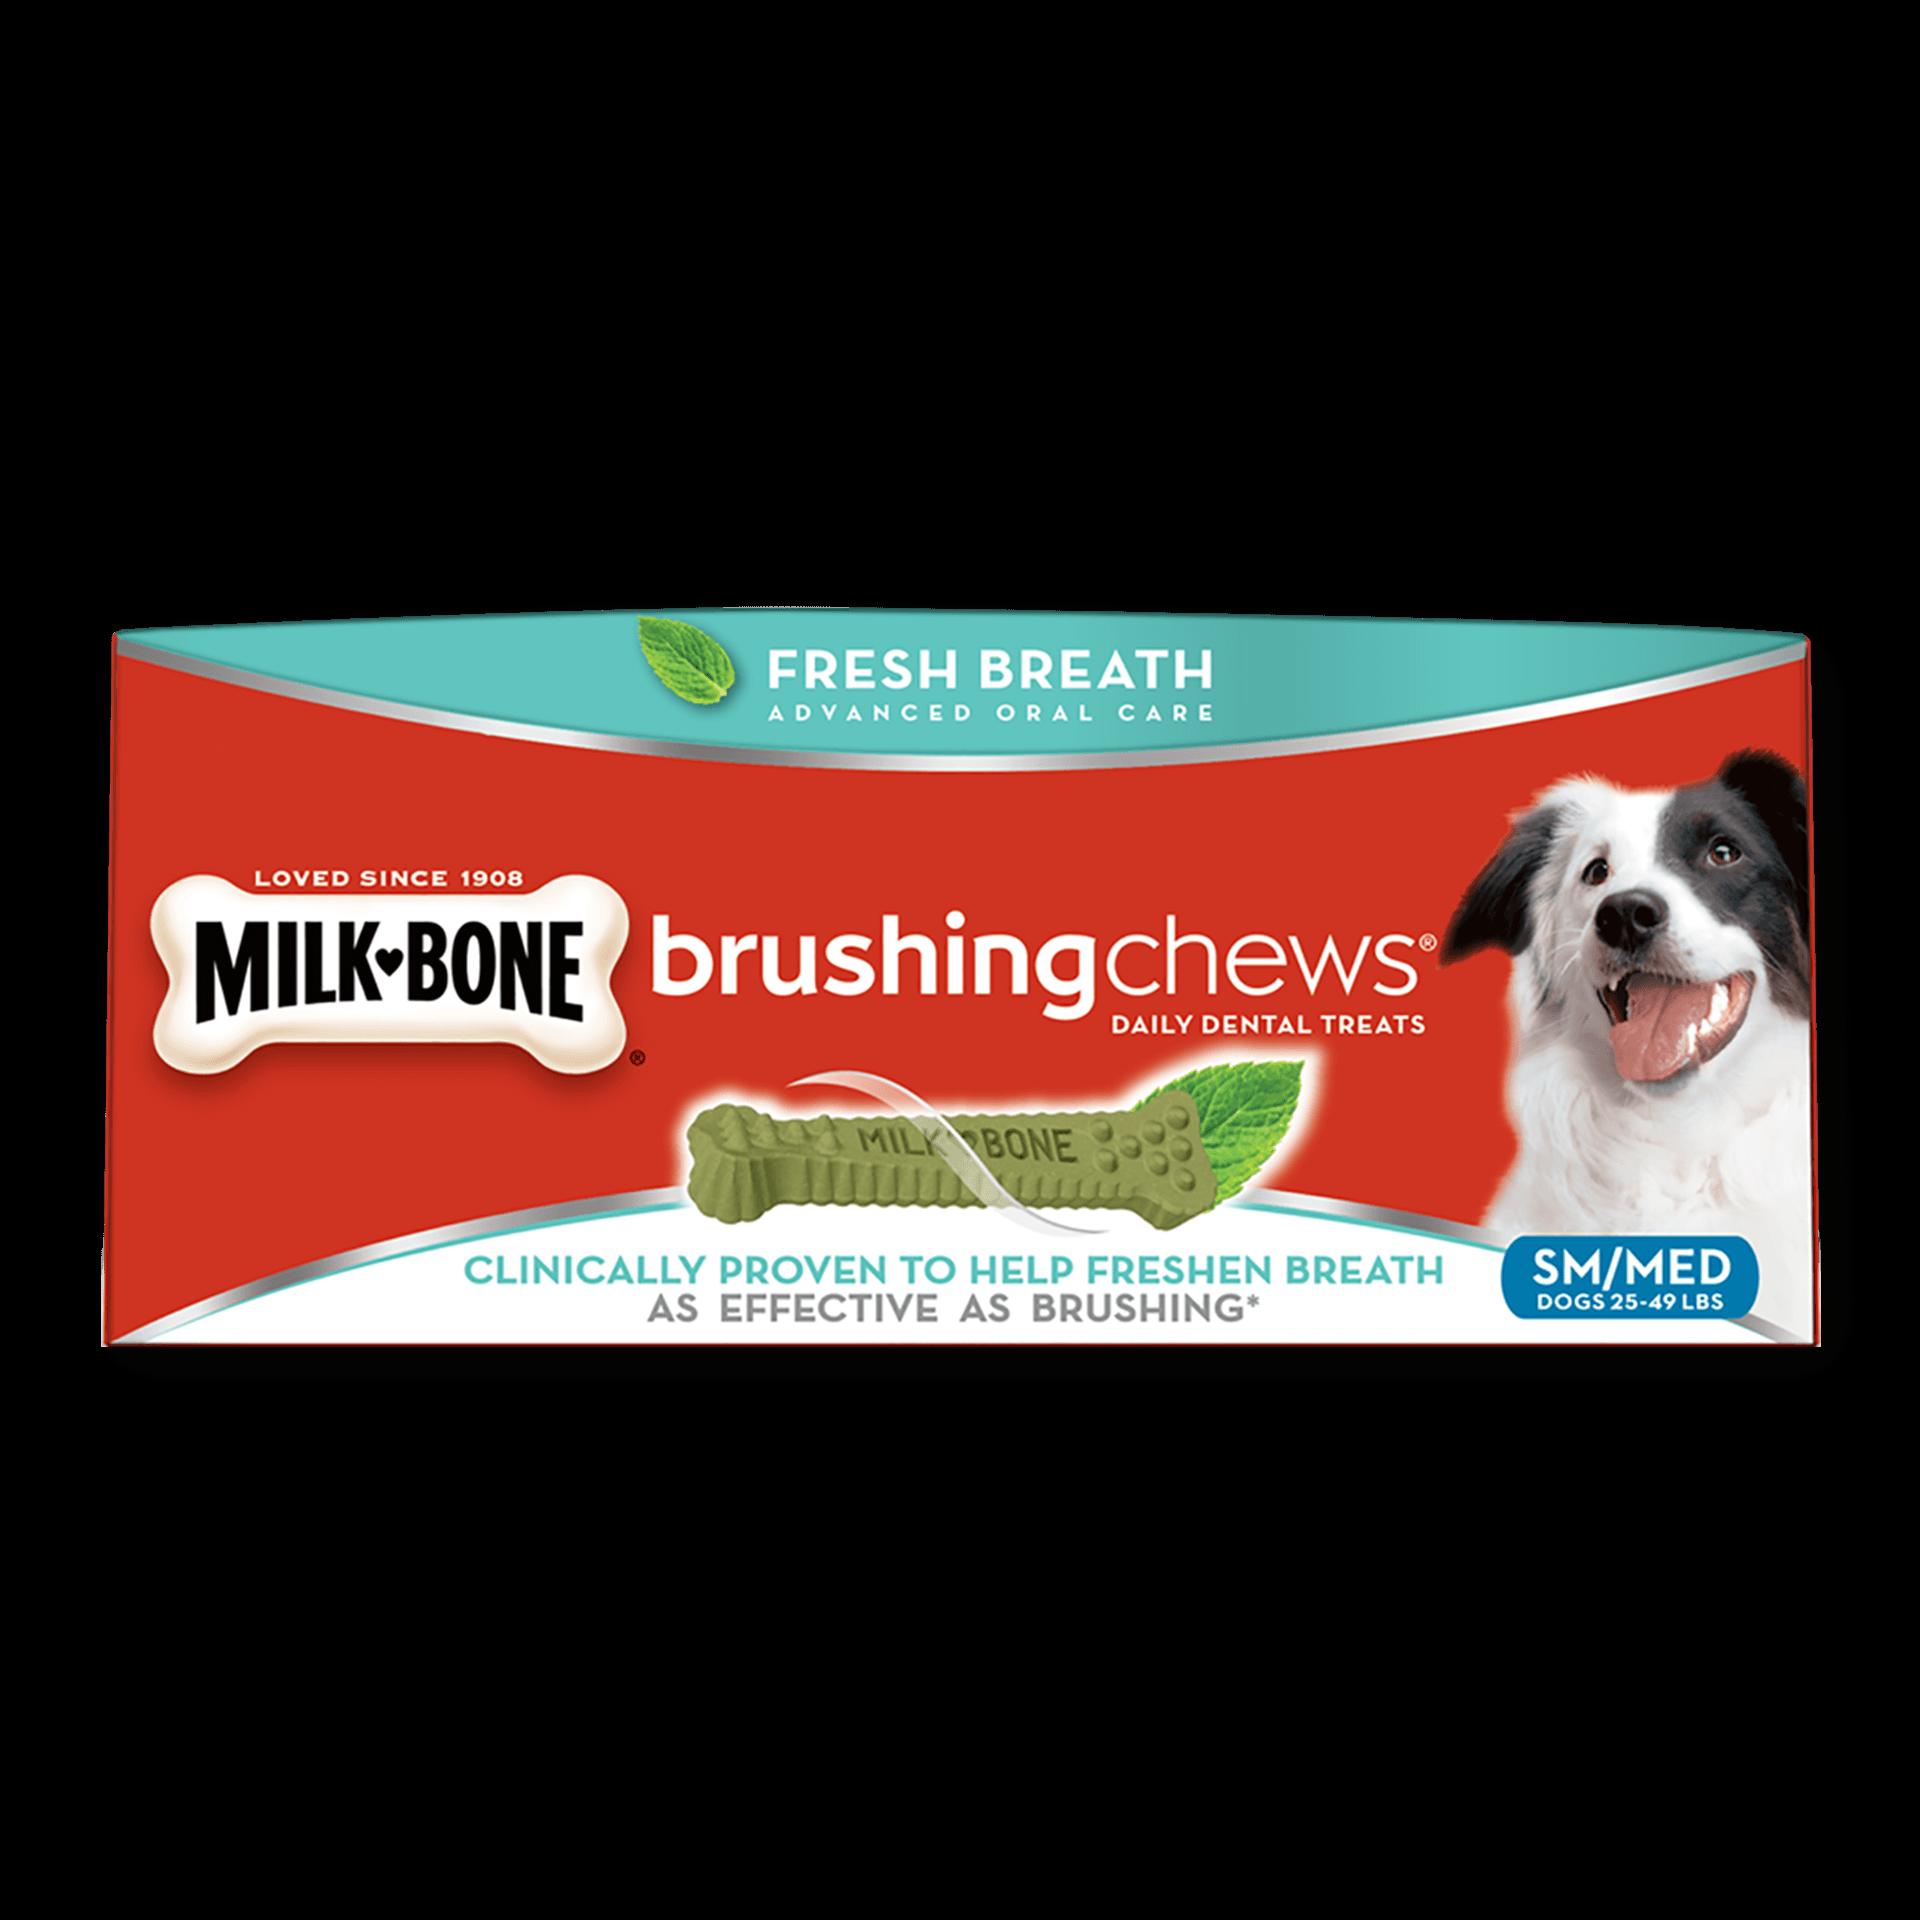 Dog brushing teeth clipart free stock Brushing Chews®: Dog Dental Treats for Strong Bones | Milk-Bone® free stock